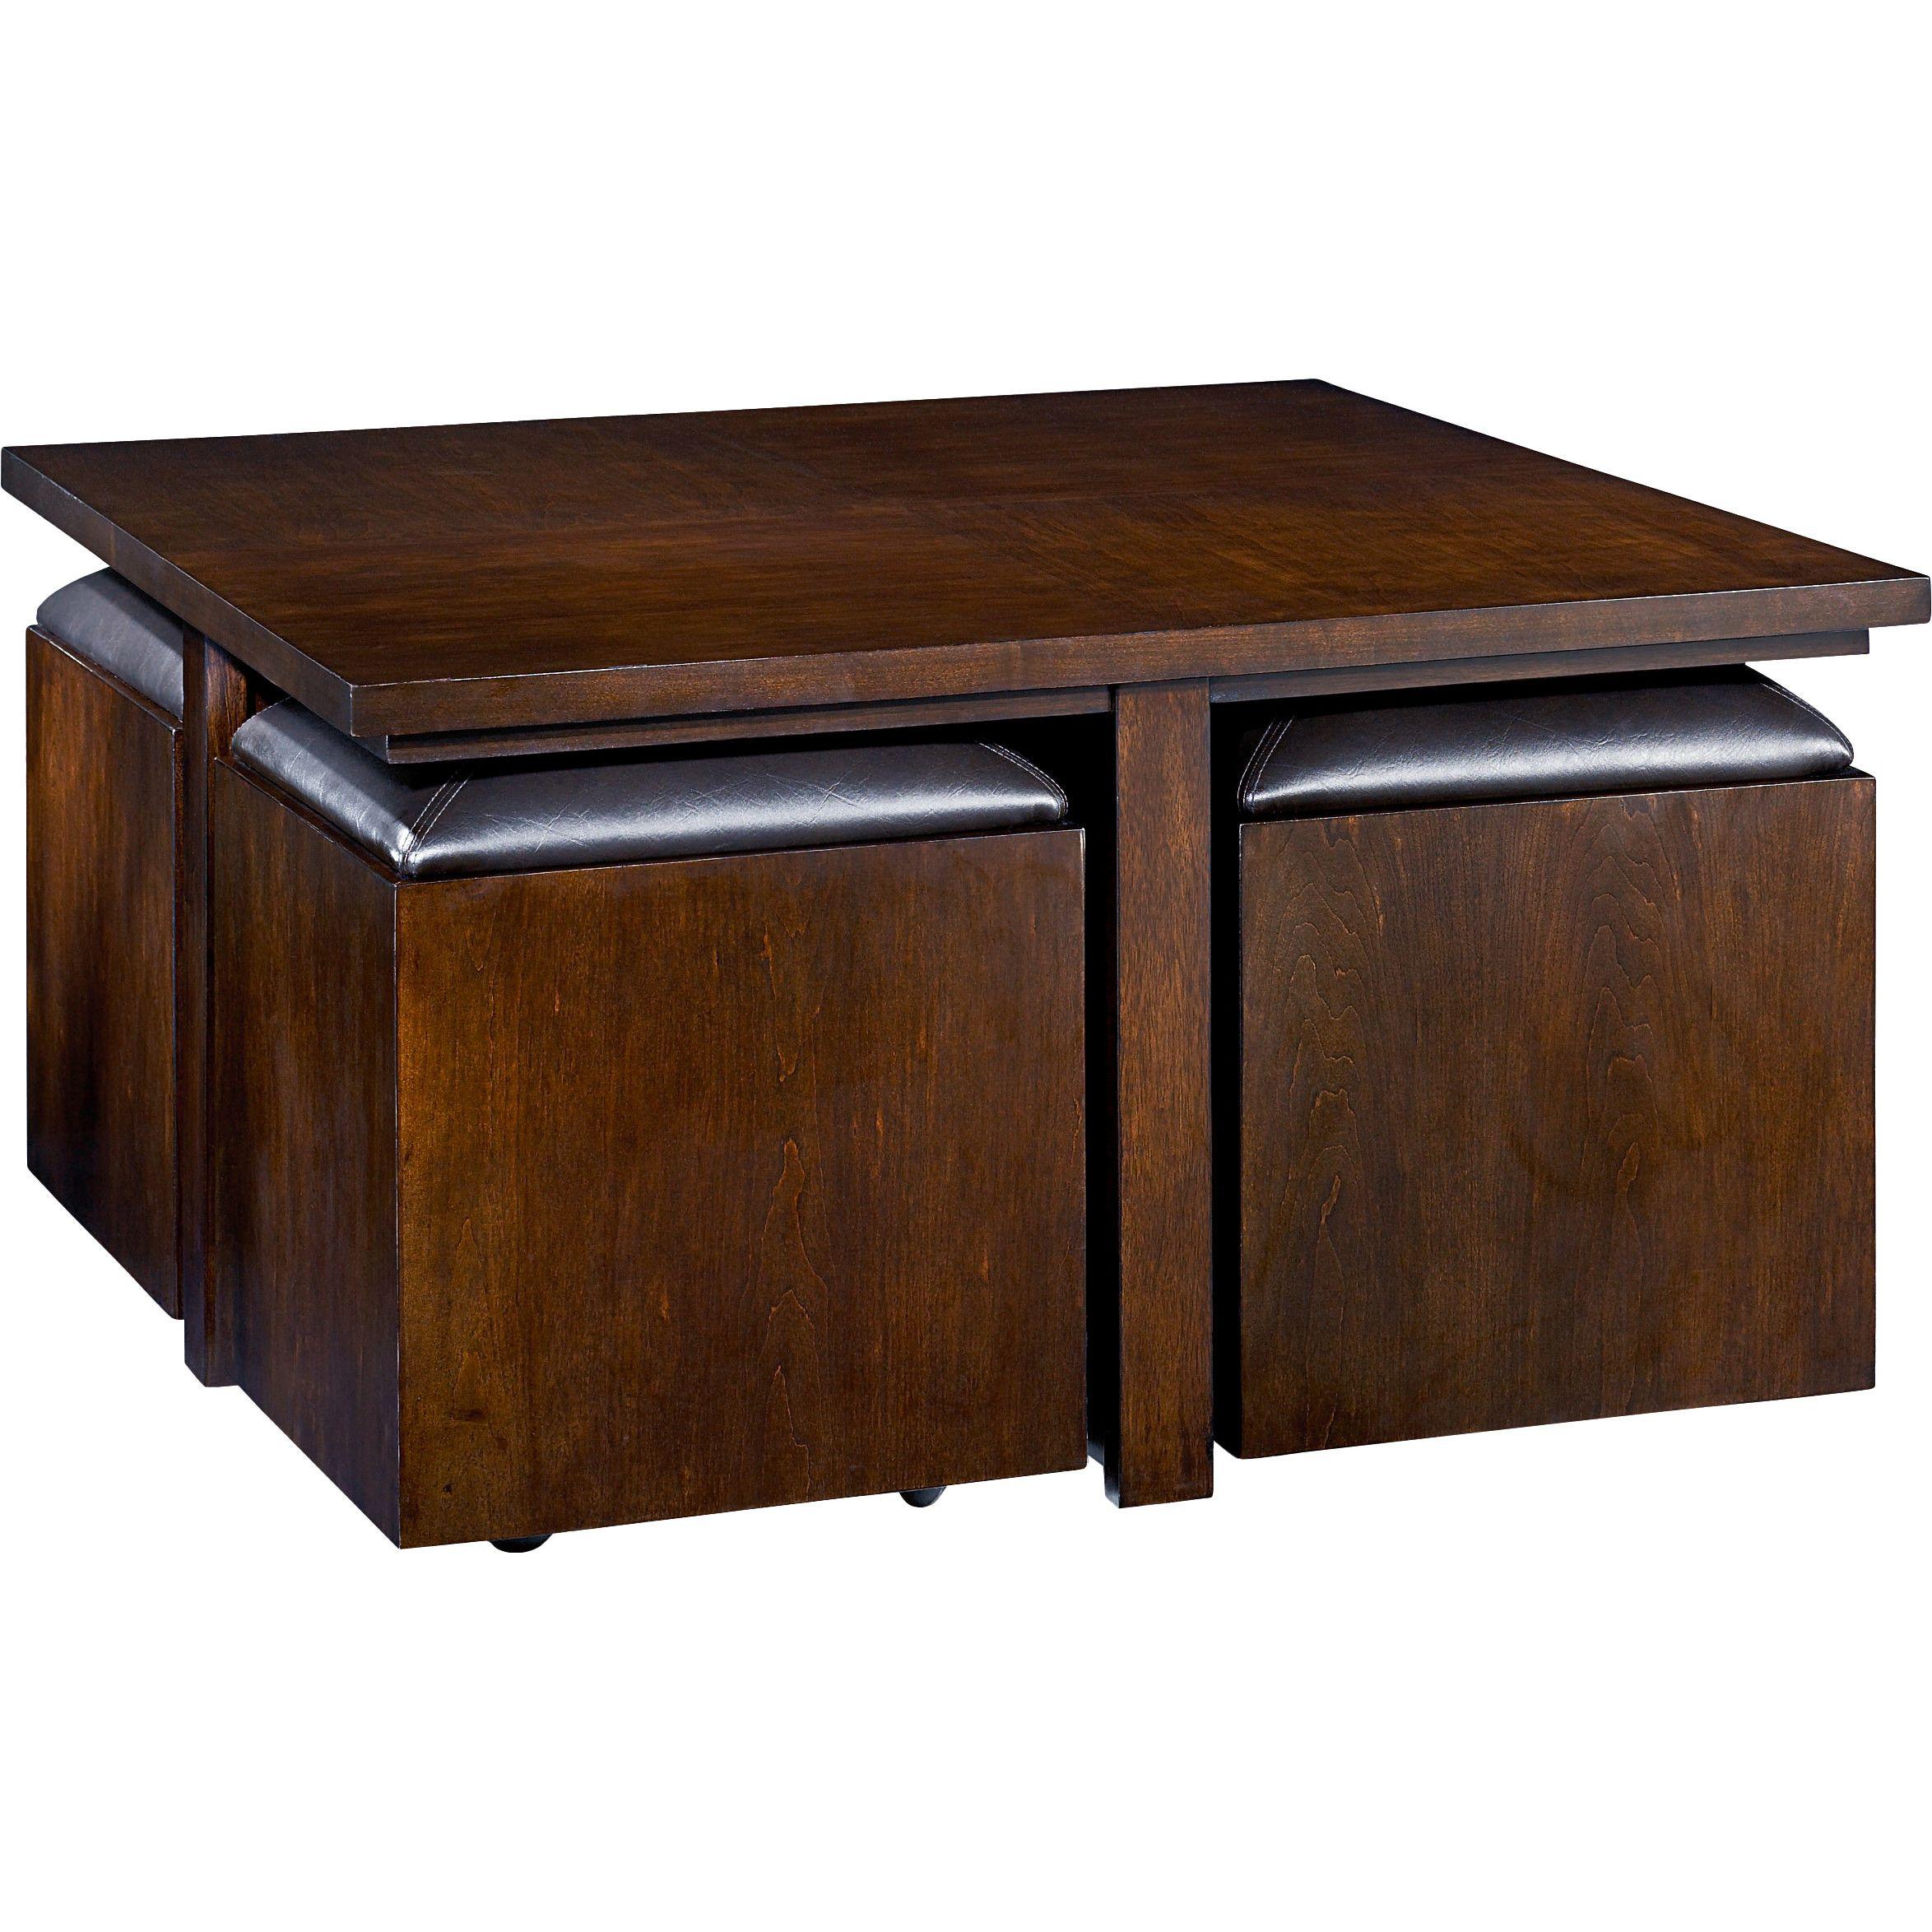 Super Cruz Coffee Table Coffee Table With Seating Ottoman Table Evergreenethics Interior Chair Design Evergreenethicsorg